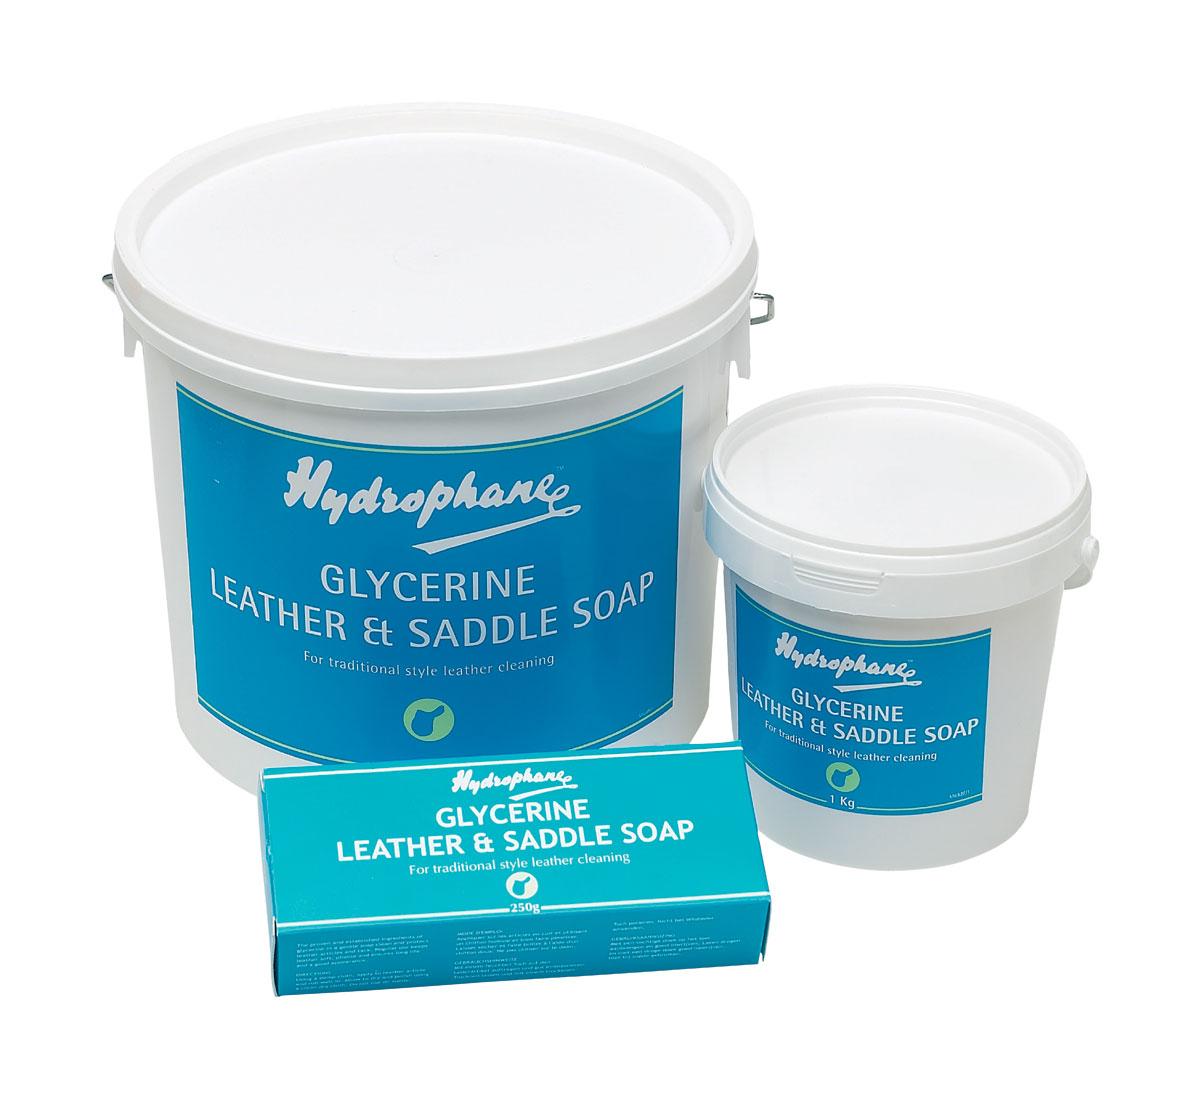 Hydrophane Glycerine Leather & Saddle Soap